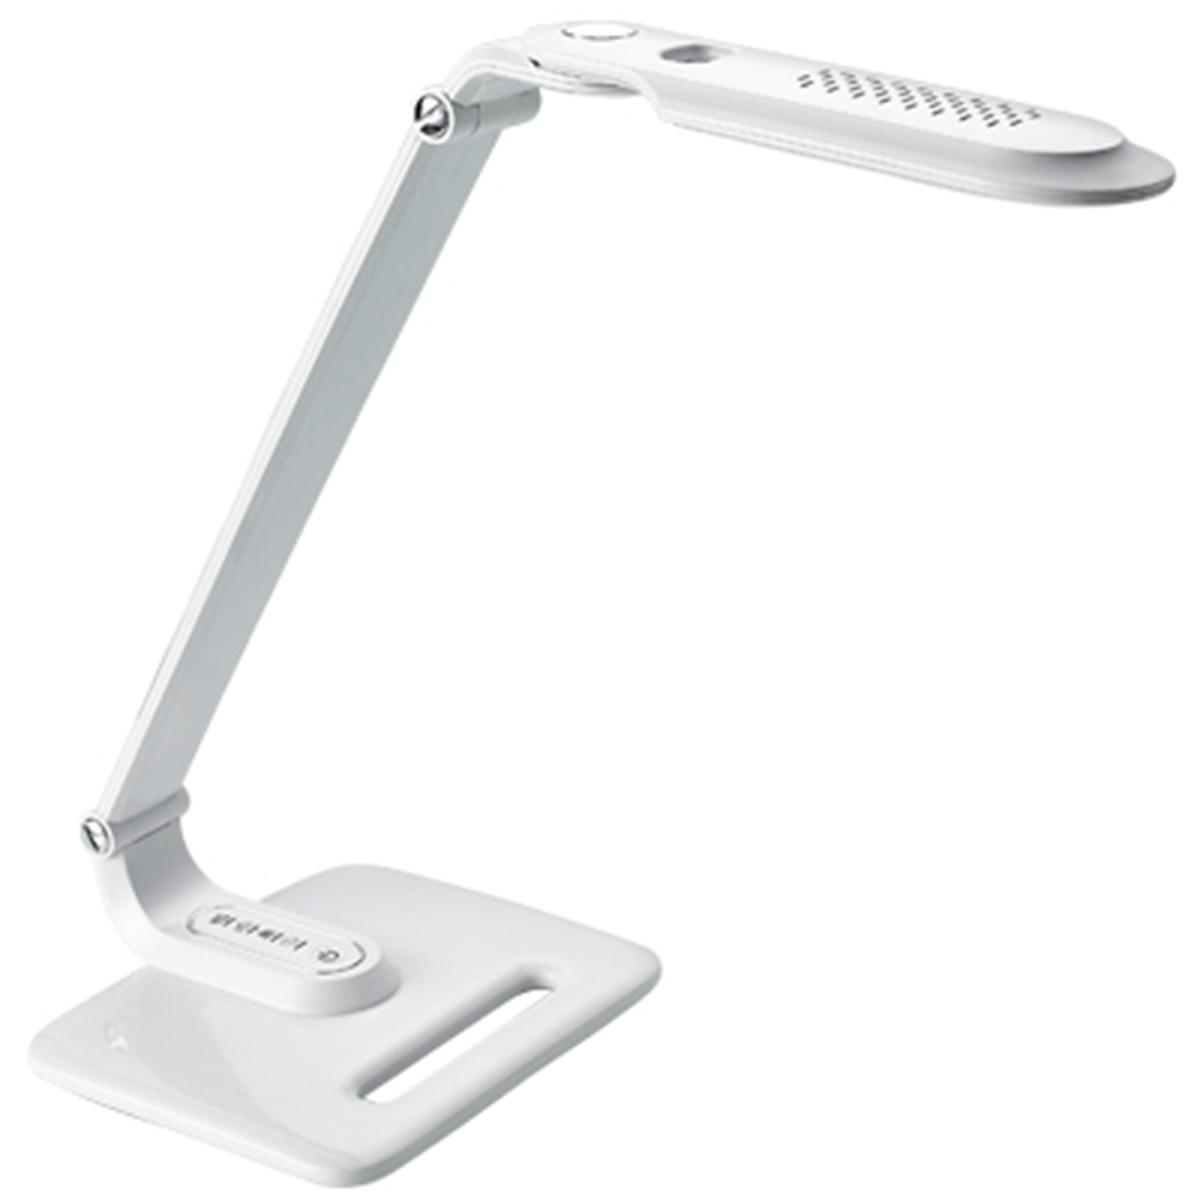 LED Bureaulamp - Aigi Eindy - 8W - Natuurlijk Wit 5000K - Dimbaar - Mat Wit